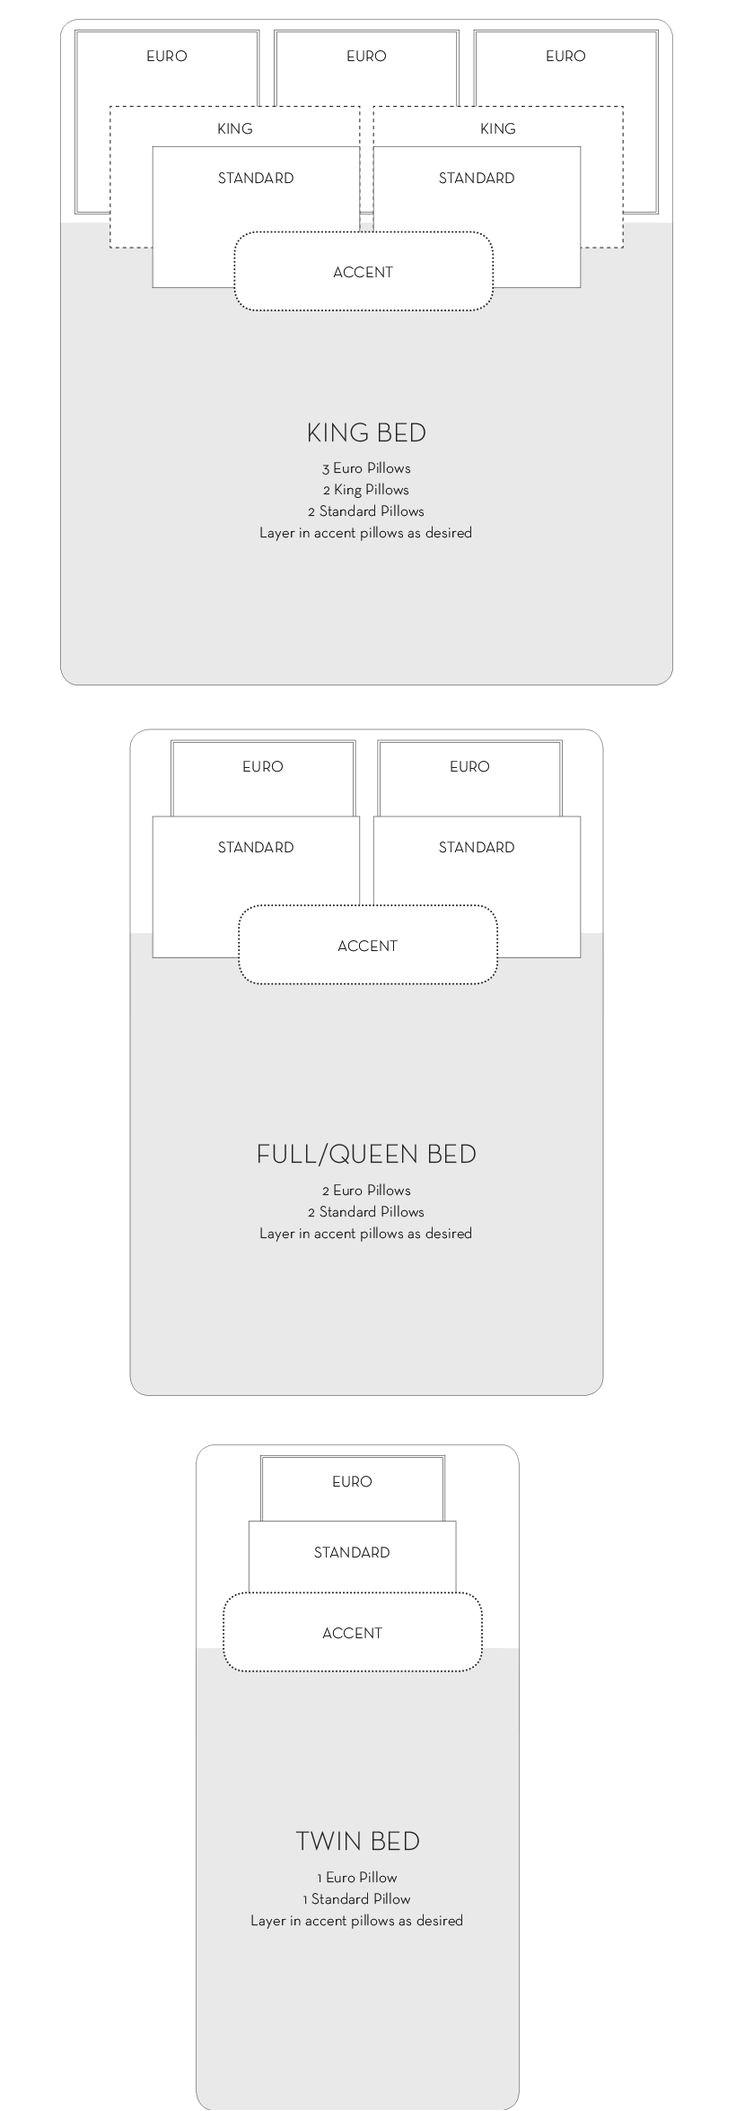 bedding atticus eastern king platform living spaces dimensions best size ideas bedroom decorating sleep number feet